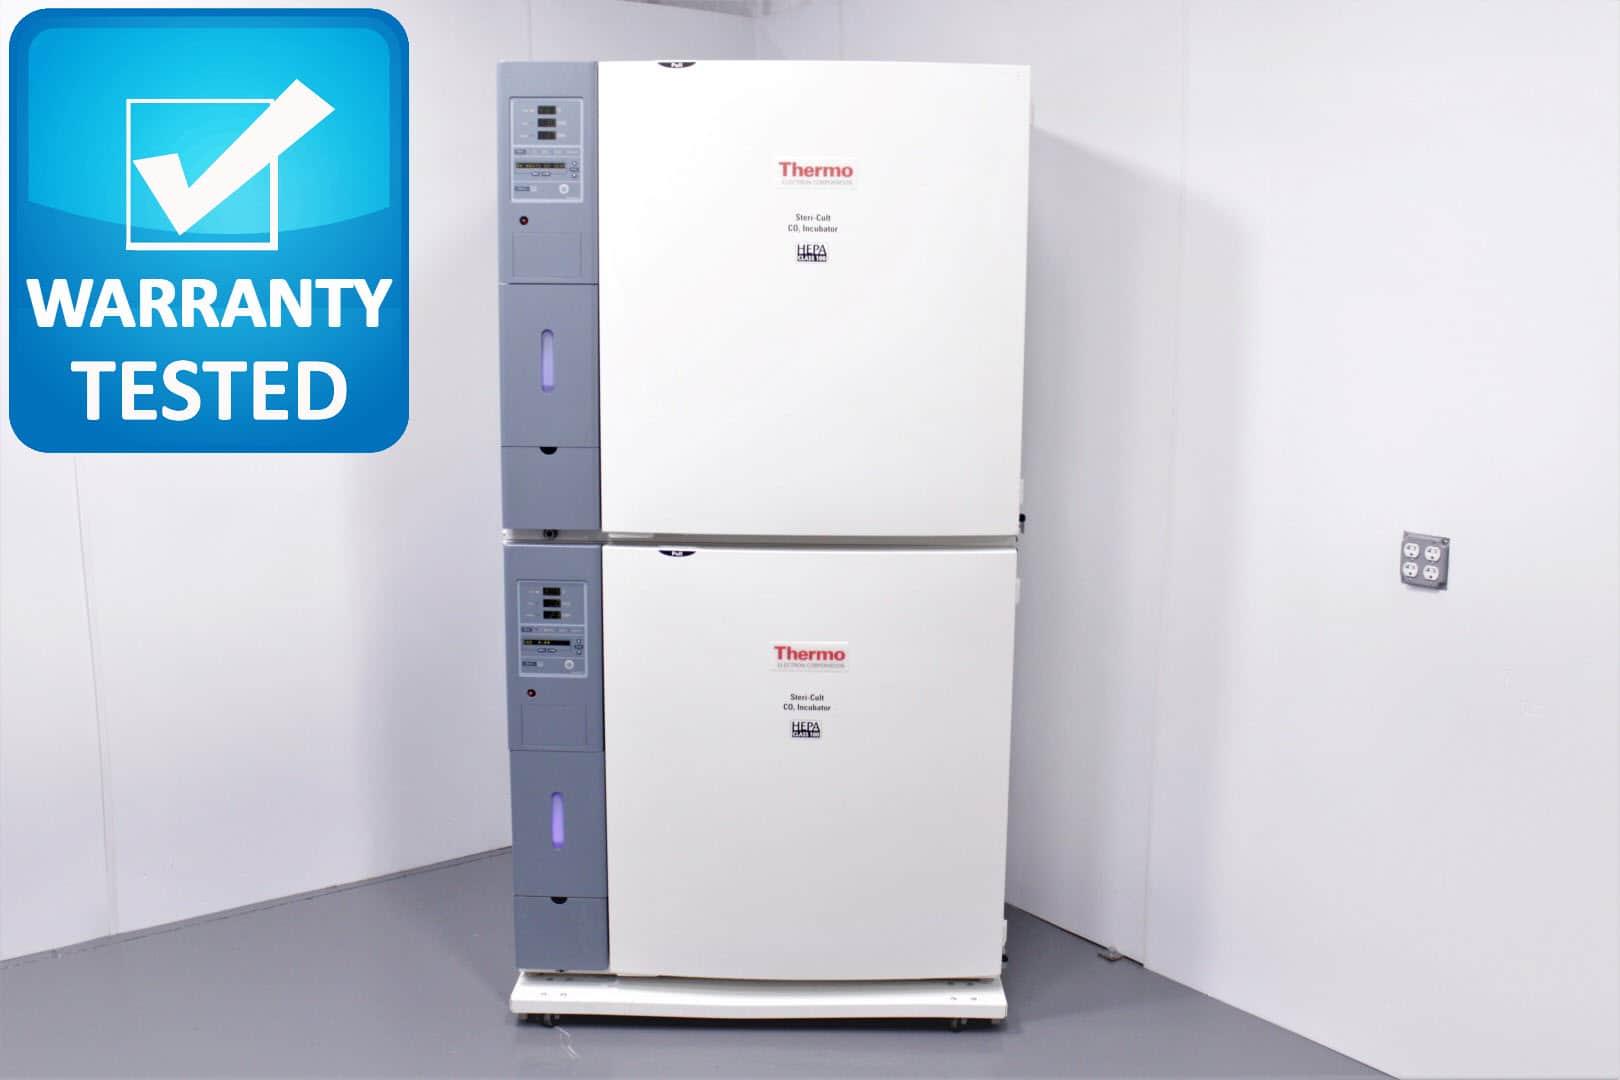 Thermo Steri-Cult CO2 Double Incubator 3310 w/ HEPA 100 Filter